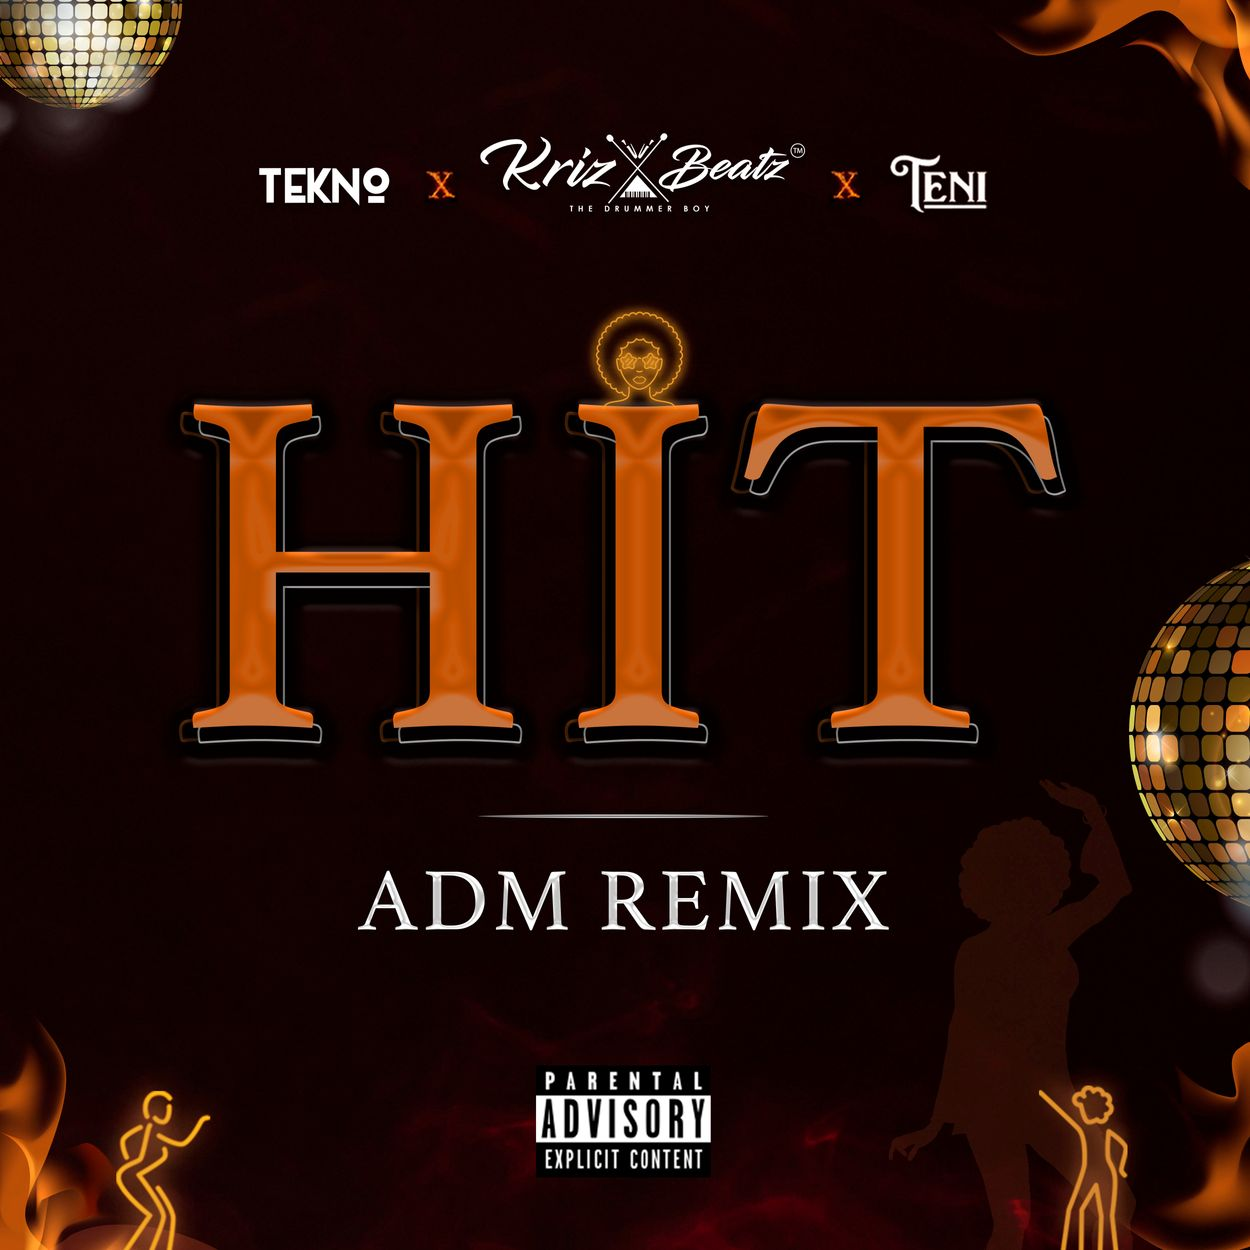 VIDEO: Krizbeatz – Hit (ADM Remix) ft. Tekno & Teni